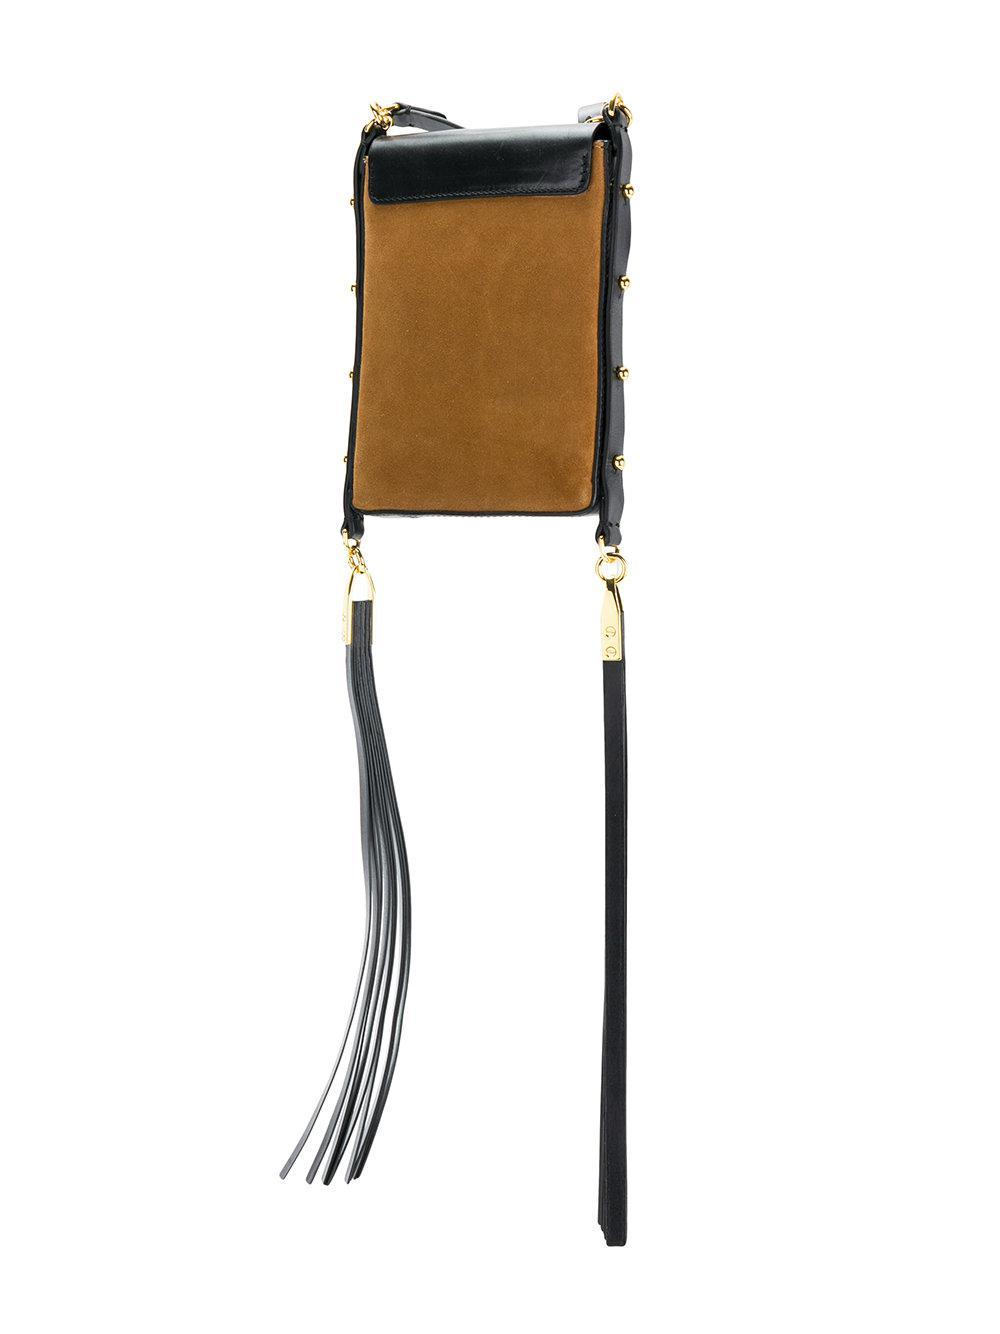 tassel trim crossbody bag - Brown Isabel Marant Bpou5vxR